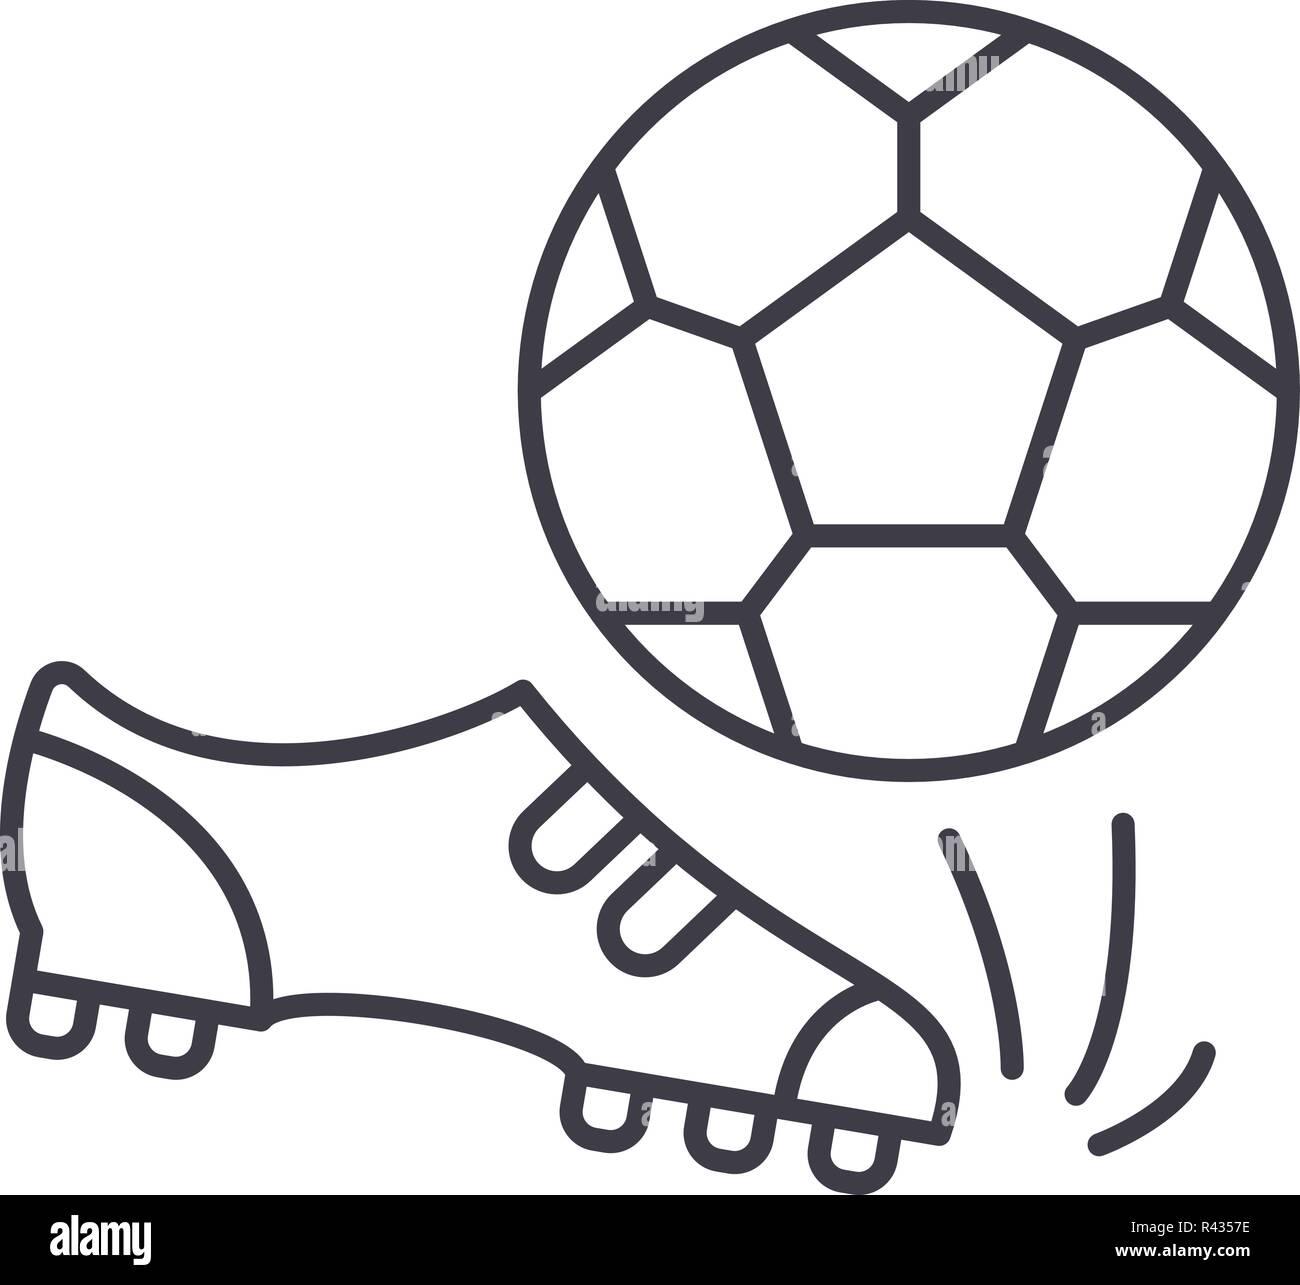 Fussball Symbol Leitung Konzept Fussball Vector Linear